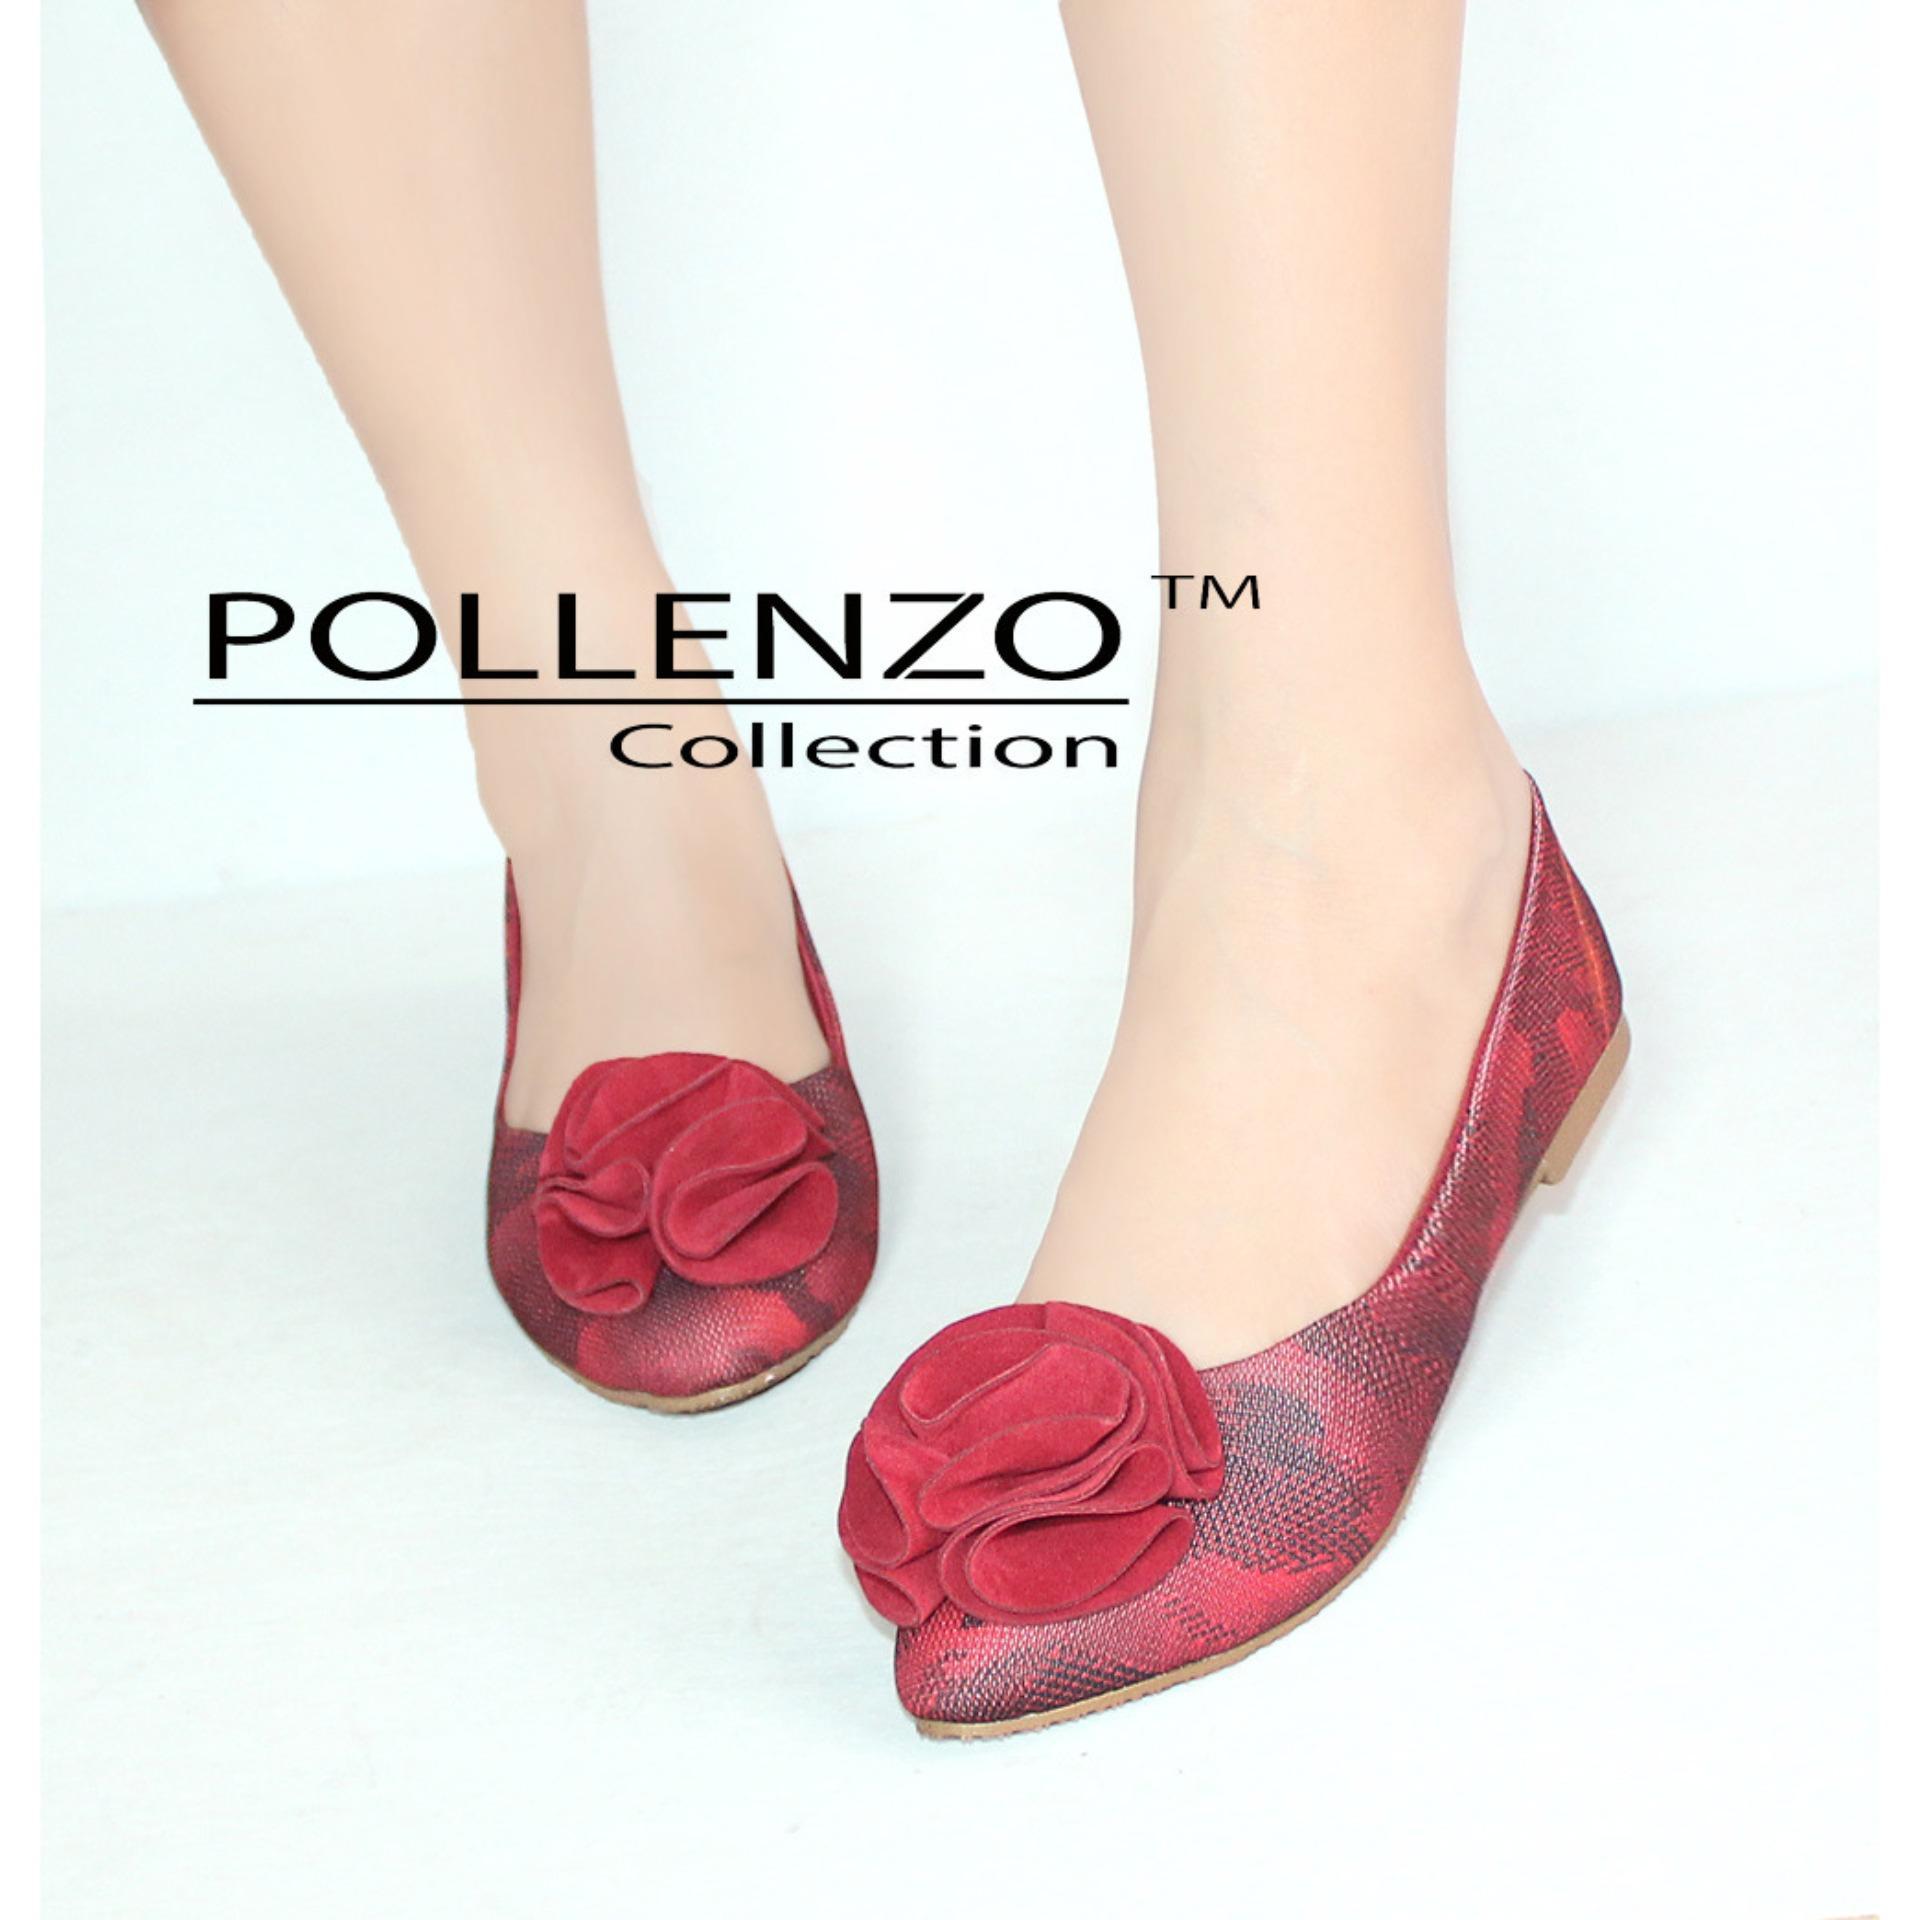 Beli Pollenzo Sepatu Wanita Flat Shoes Blossom Seken